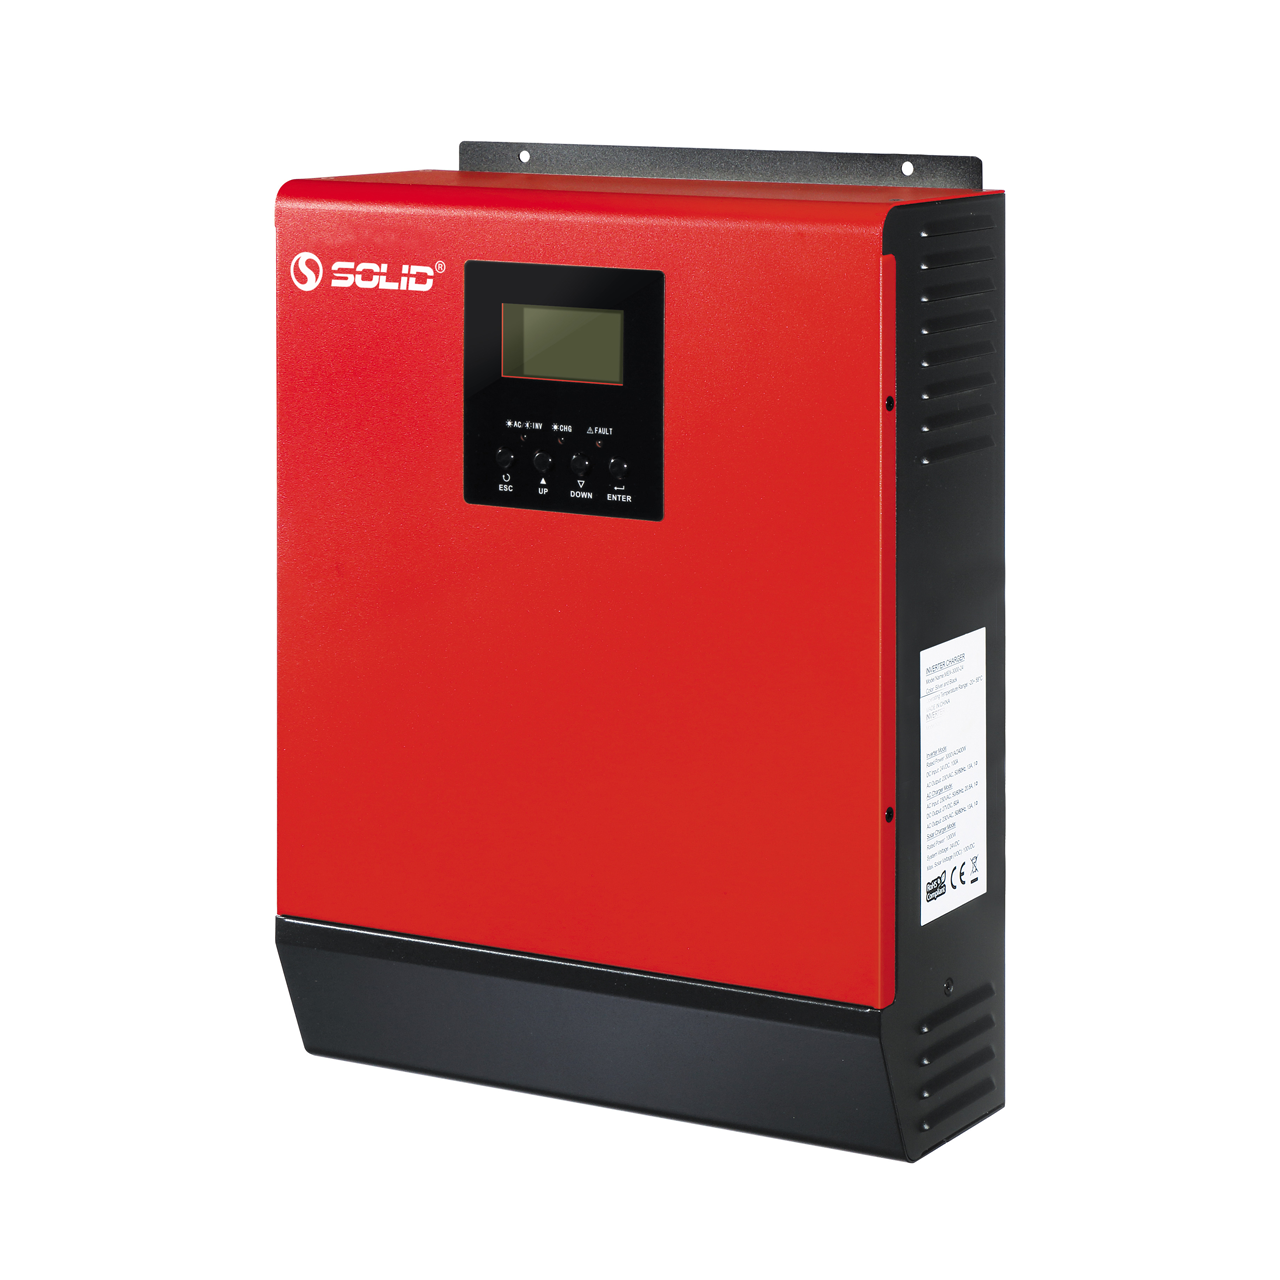 SOLID 800W 1000VA 1000w 1000 watt 1 kva 1200 watt 1kw 1 kw off grid hybrid solar inverter price with MPPT charge controller